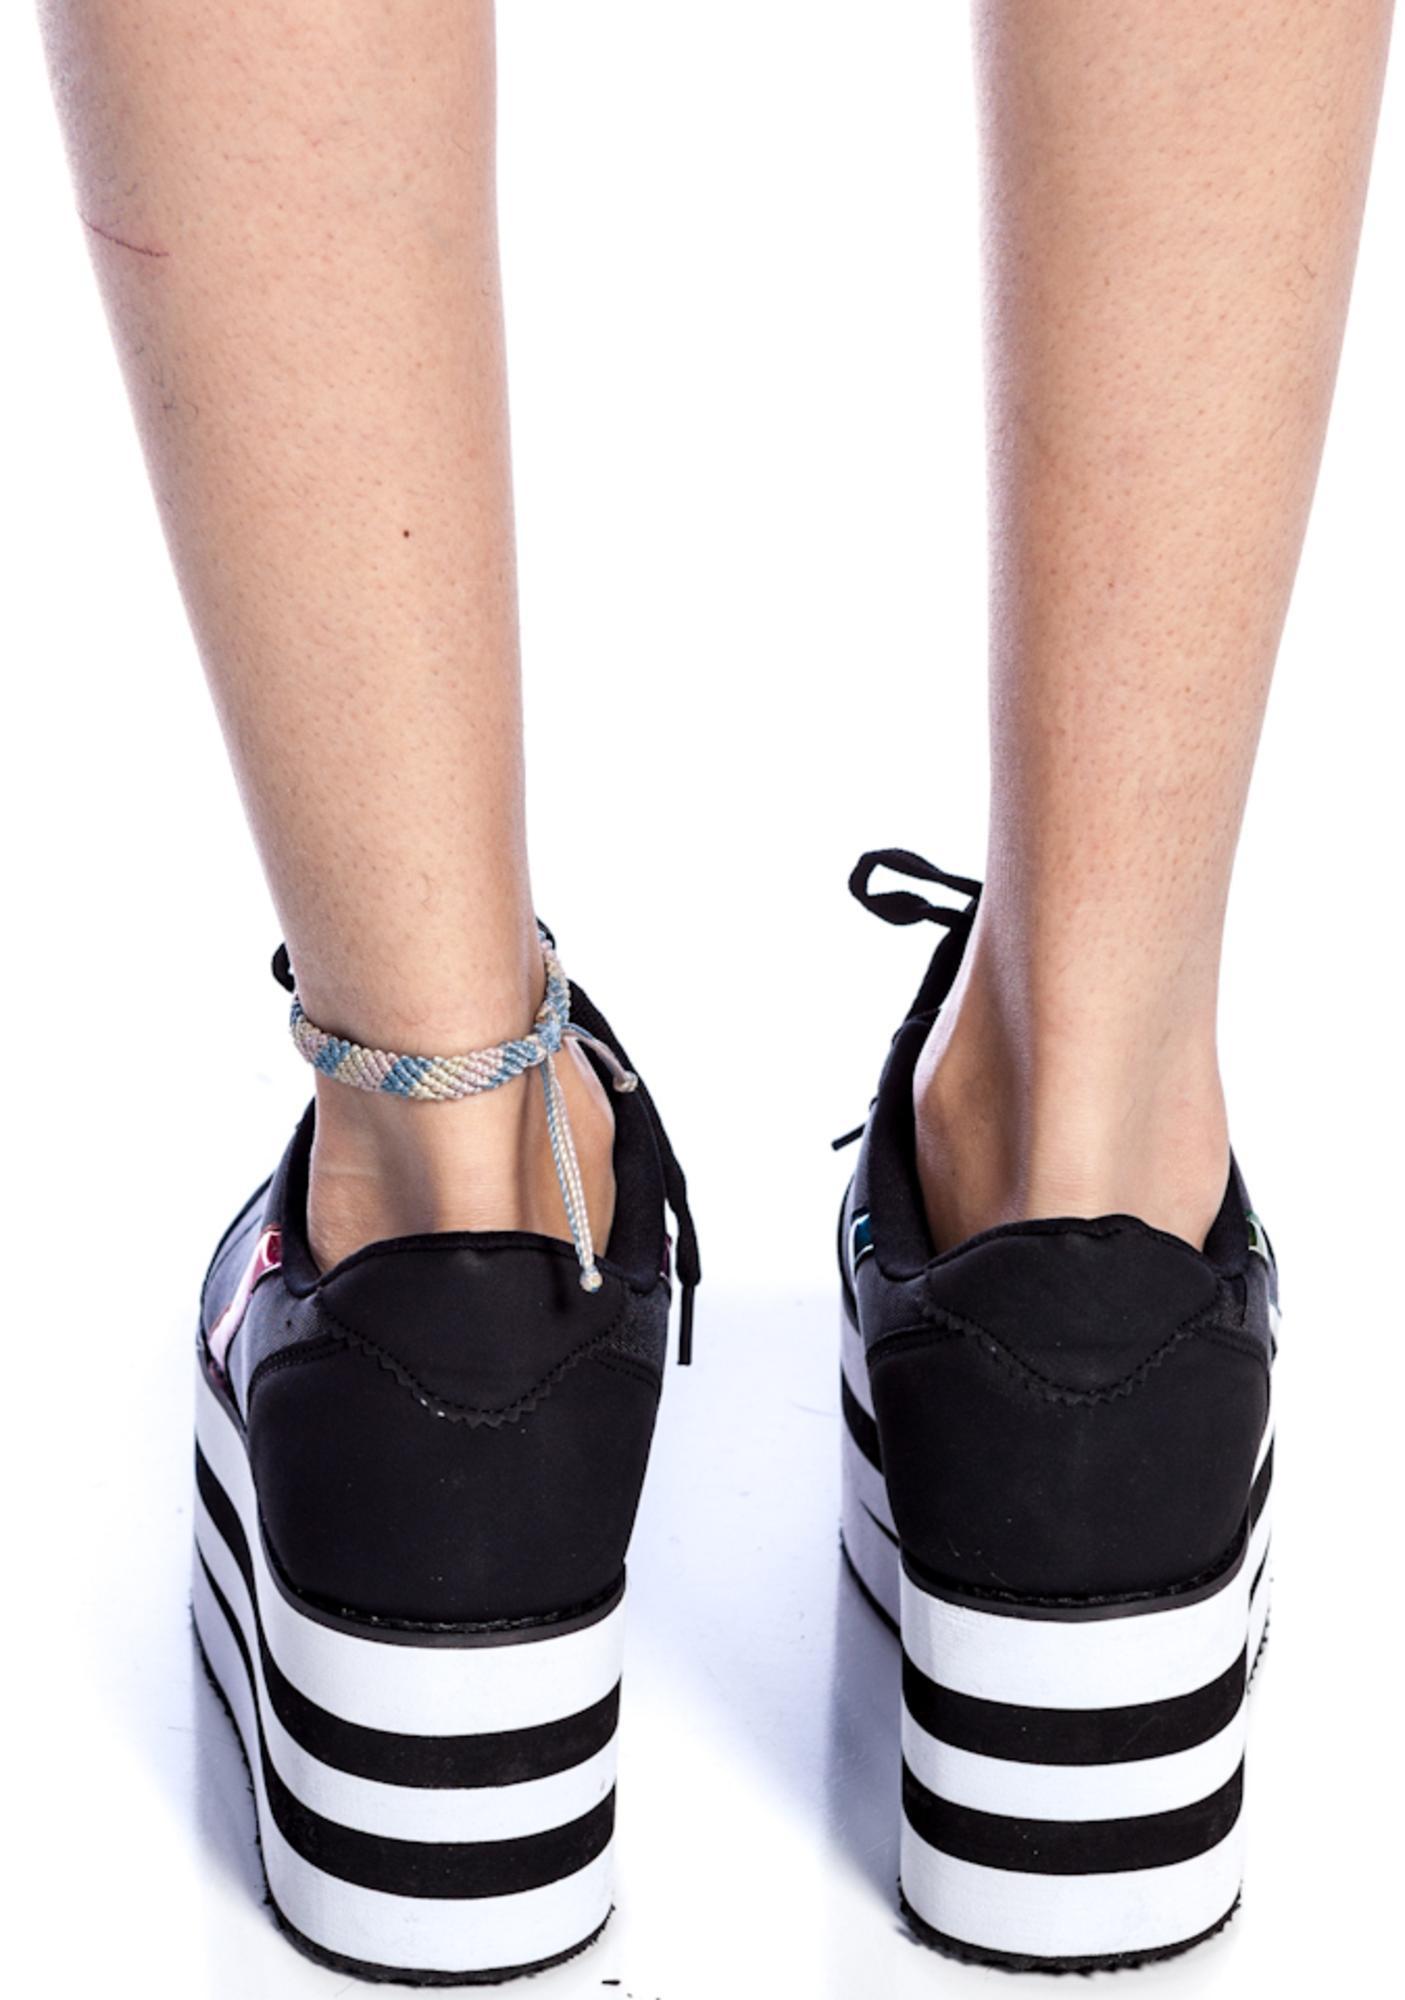 65f0ea403c8 Very High Platform Shoes - Style Guru  Fashion